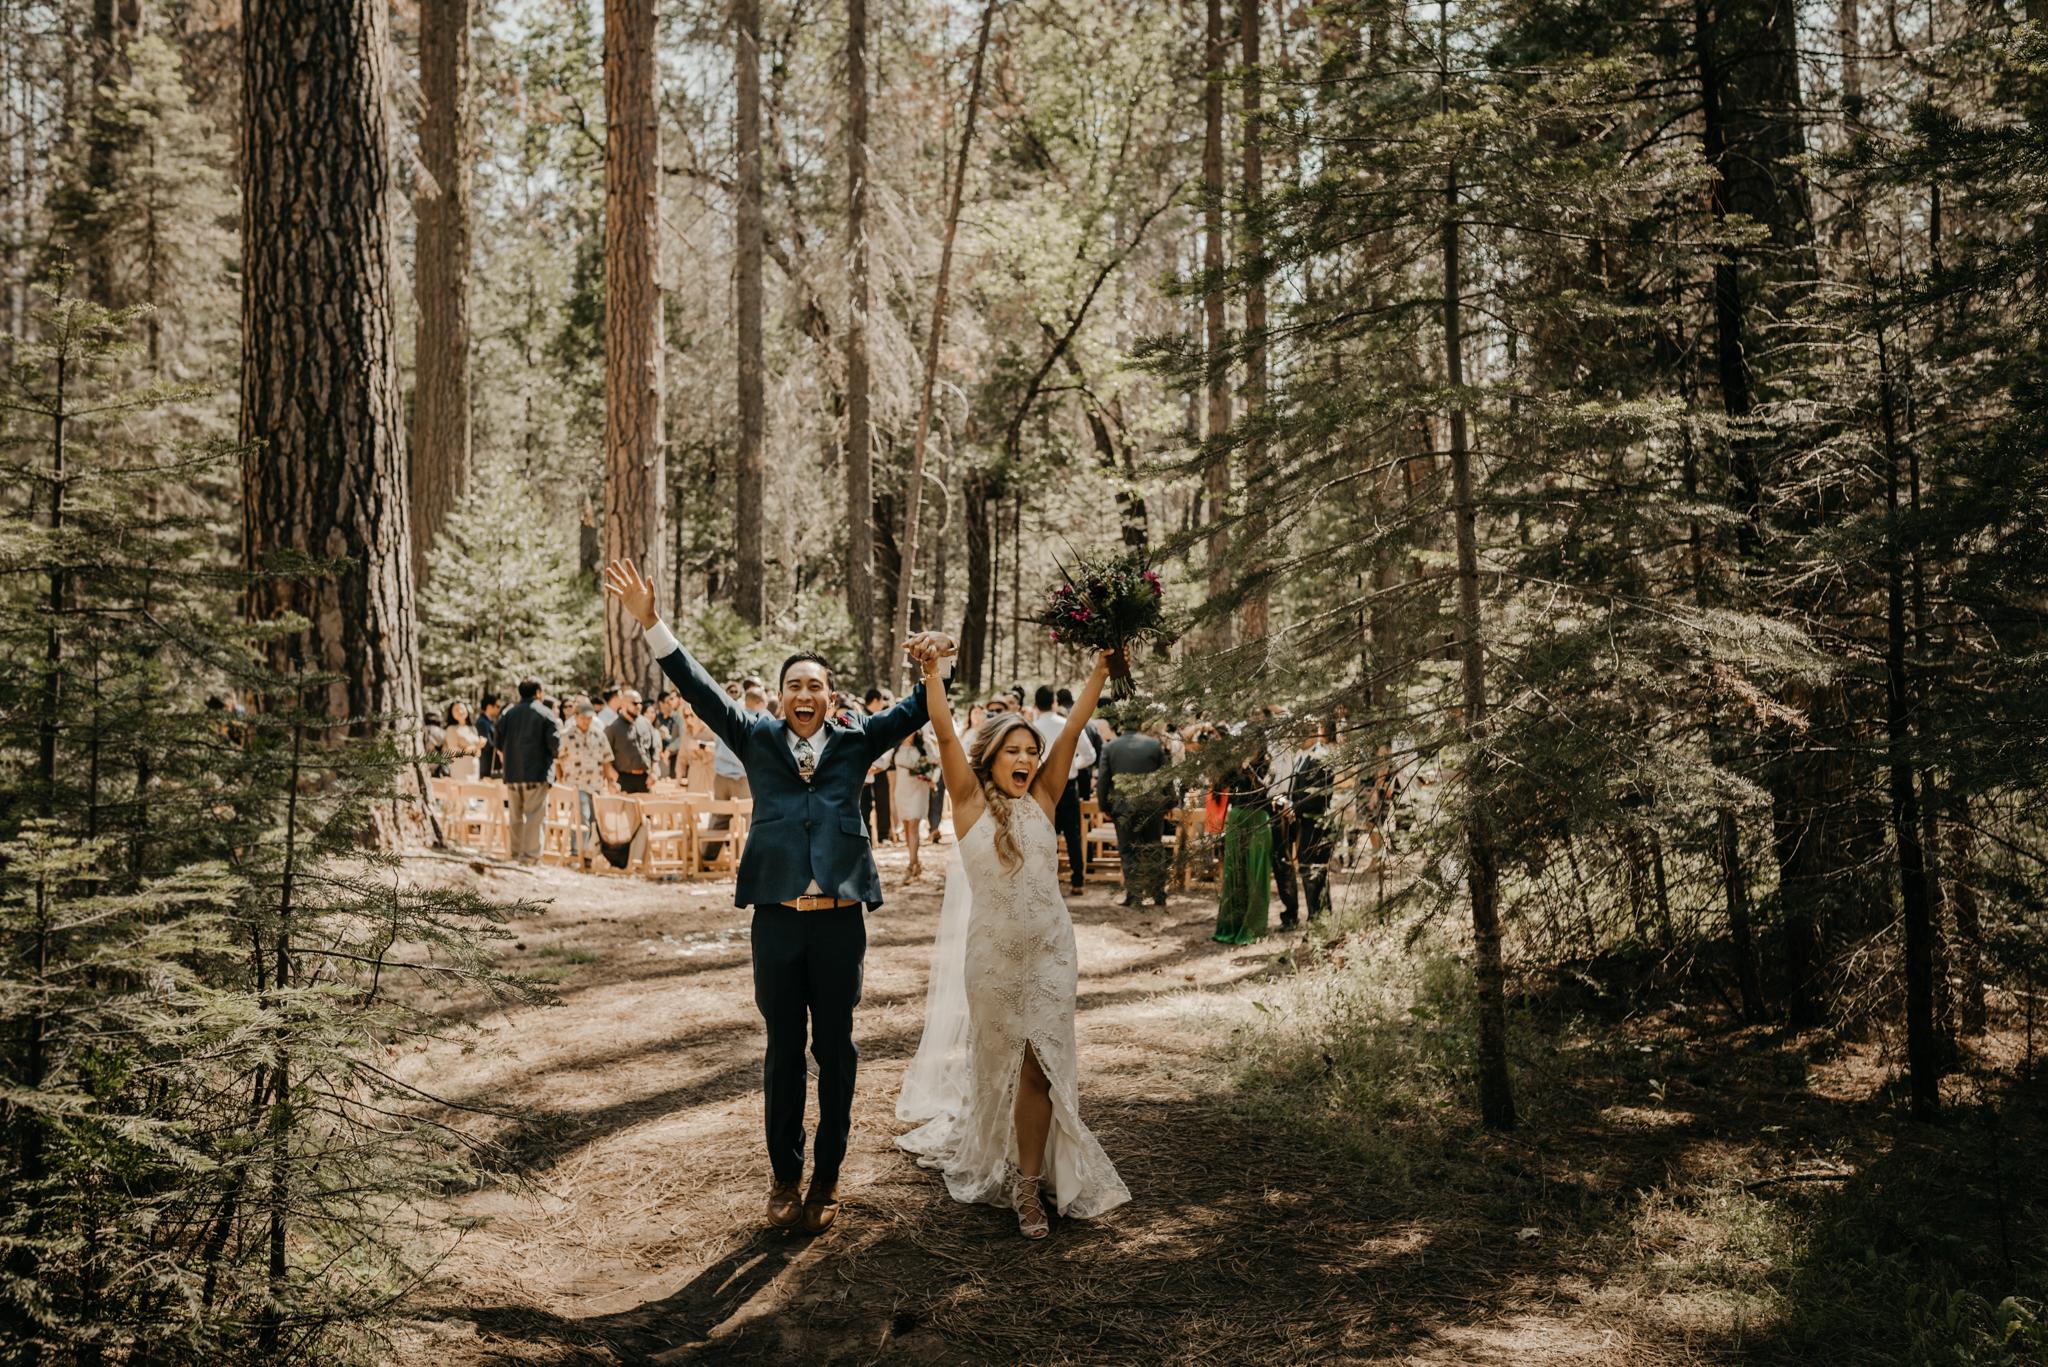 © Isaiah + Taylor Photography - Evergreen Lodge Destination Yoesmite Wedding - Los Angeles Wedding Photographer-124.jpg